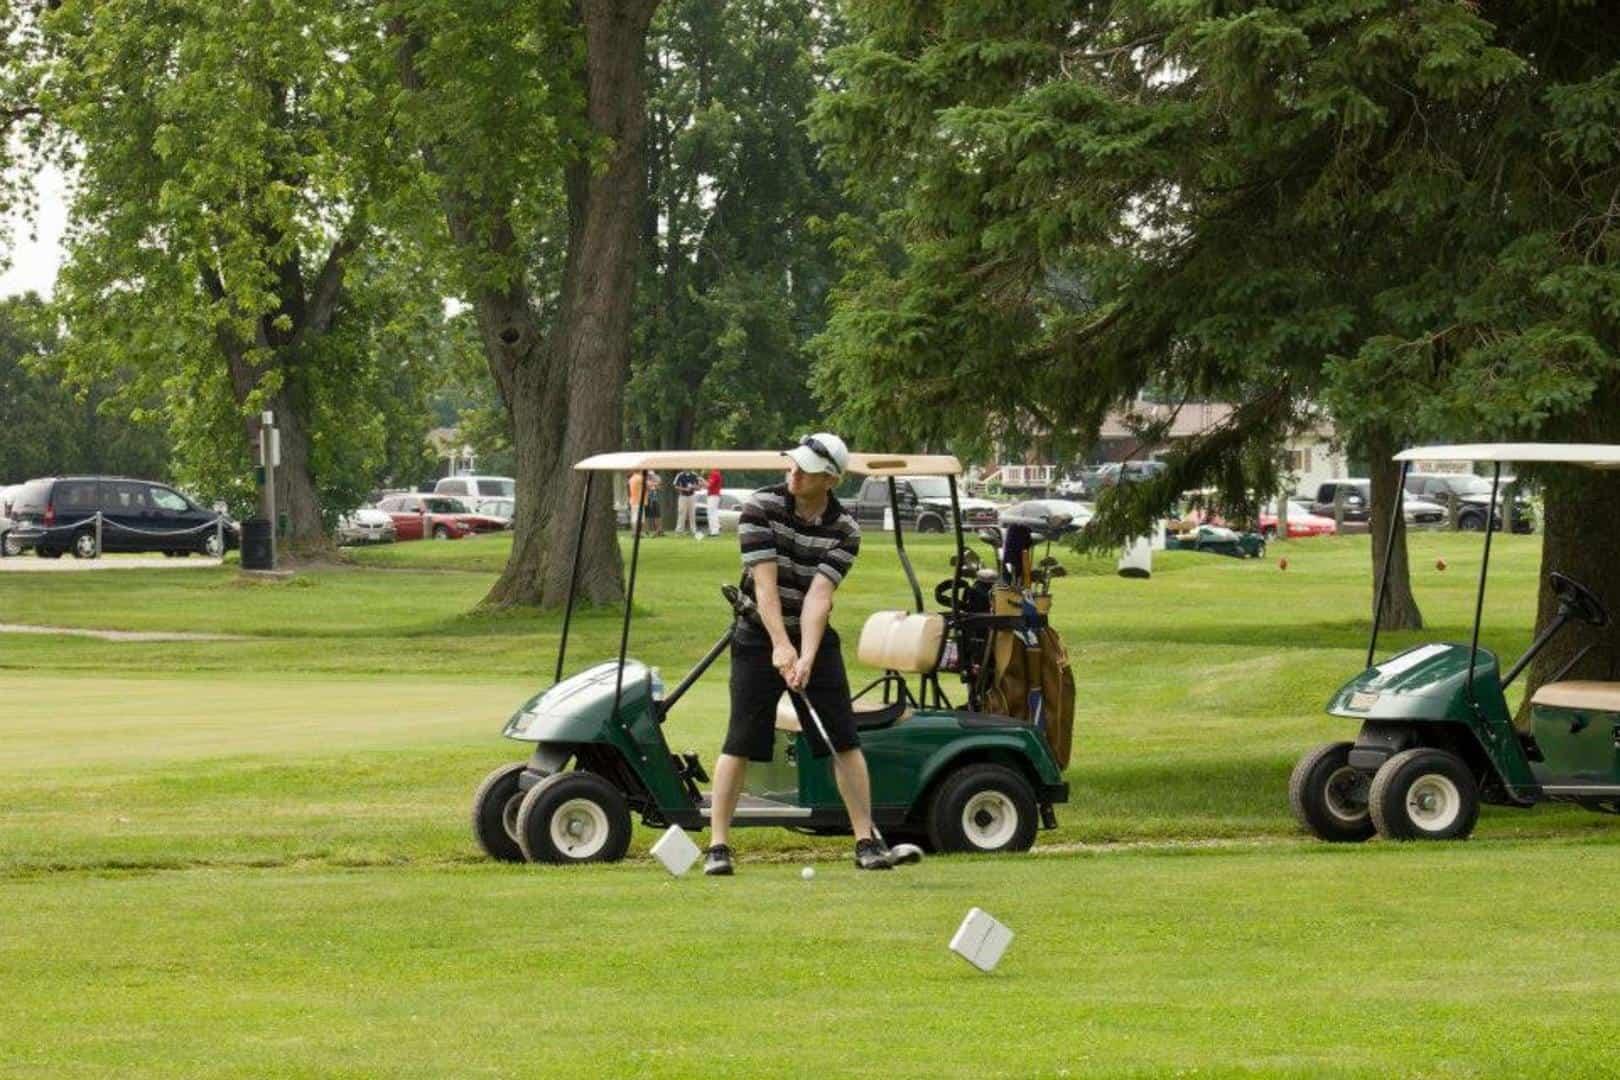 A man is playing golf in Baldoon Golf Club